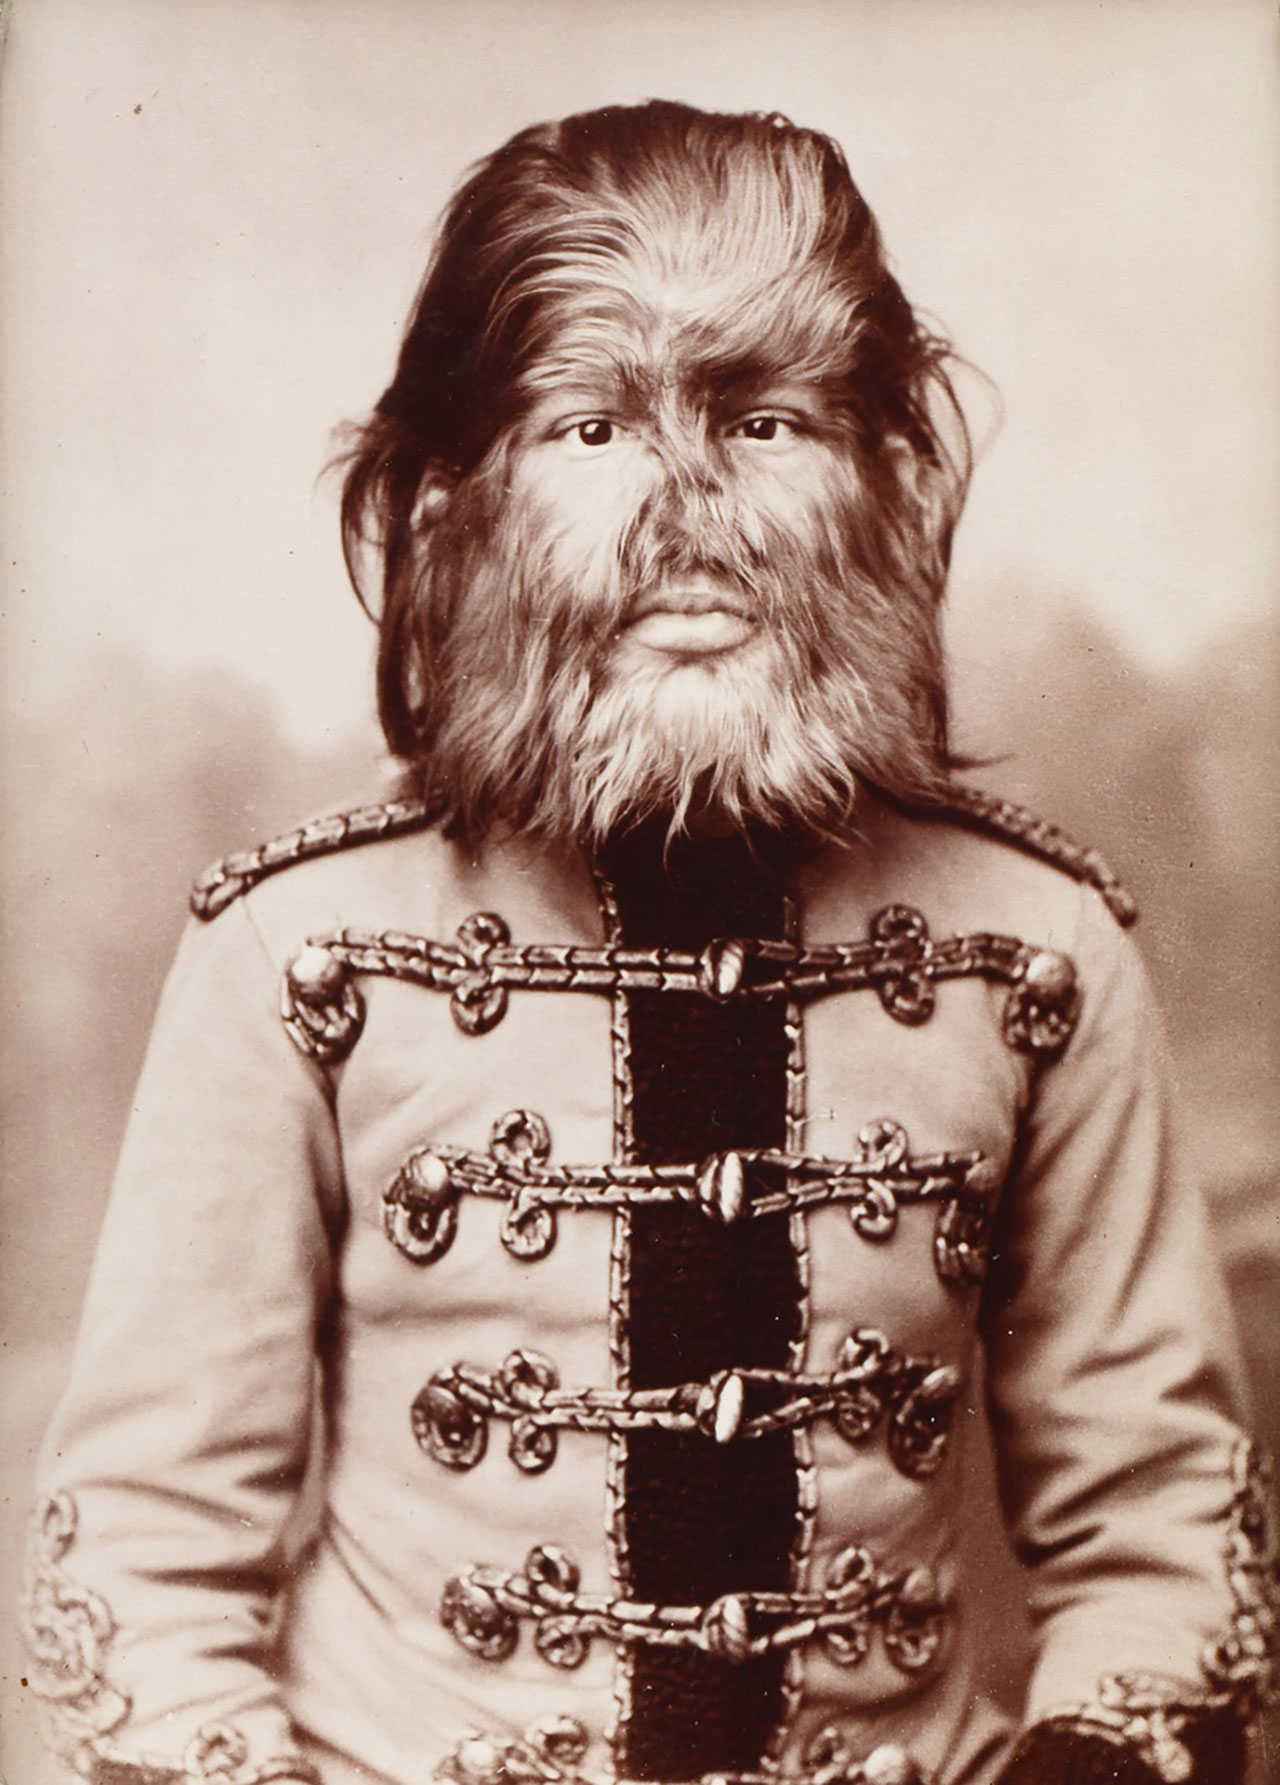 「JOJO: The Russian Dog Face Boy」(1884) Photo by Keizo Kioku, ©︎Charles Eisenmann Courtesy of Gallery Naruyama